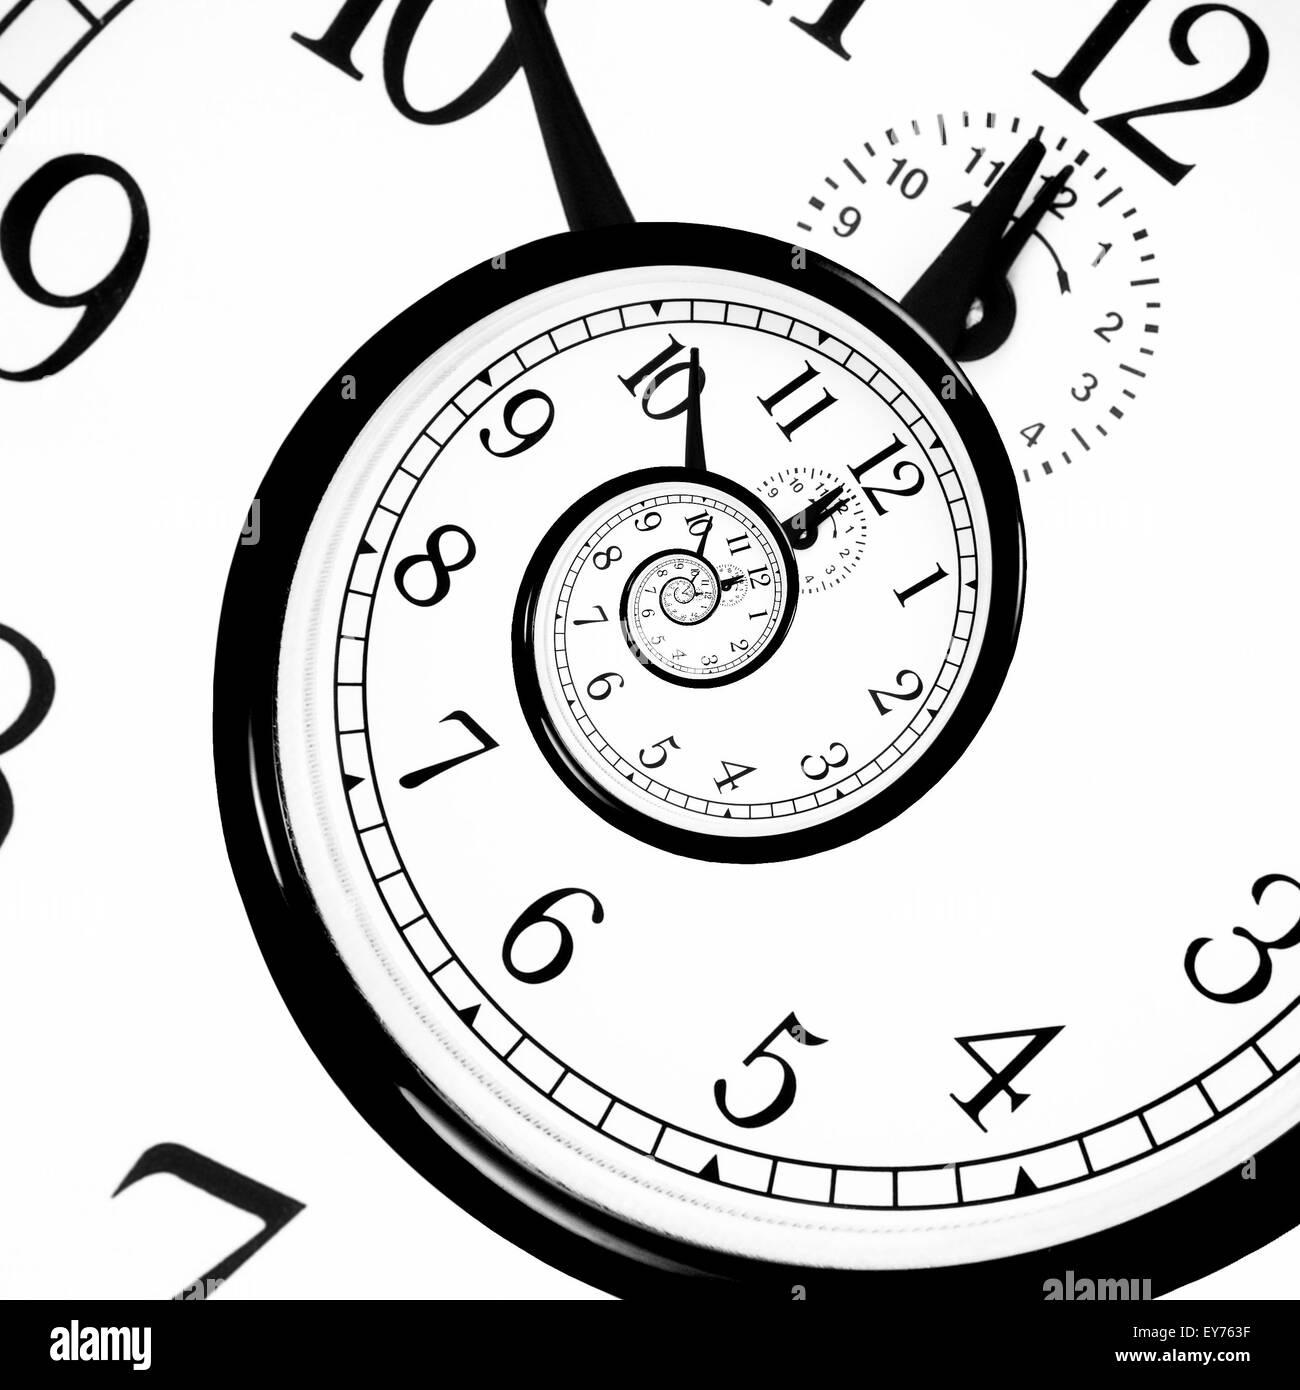 Time Warp - Time Dilation. Quantum mechanics meets general relativity. - Stock Image